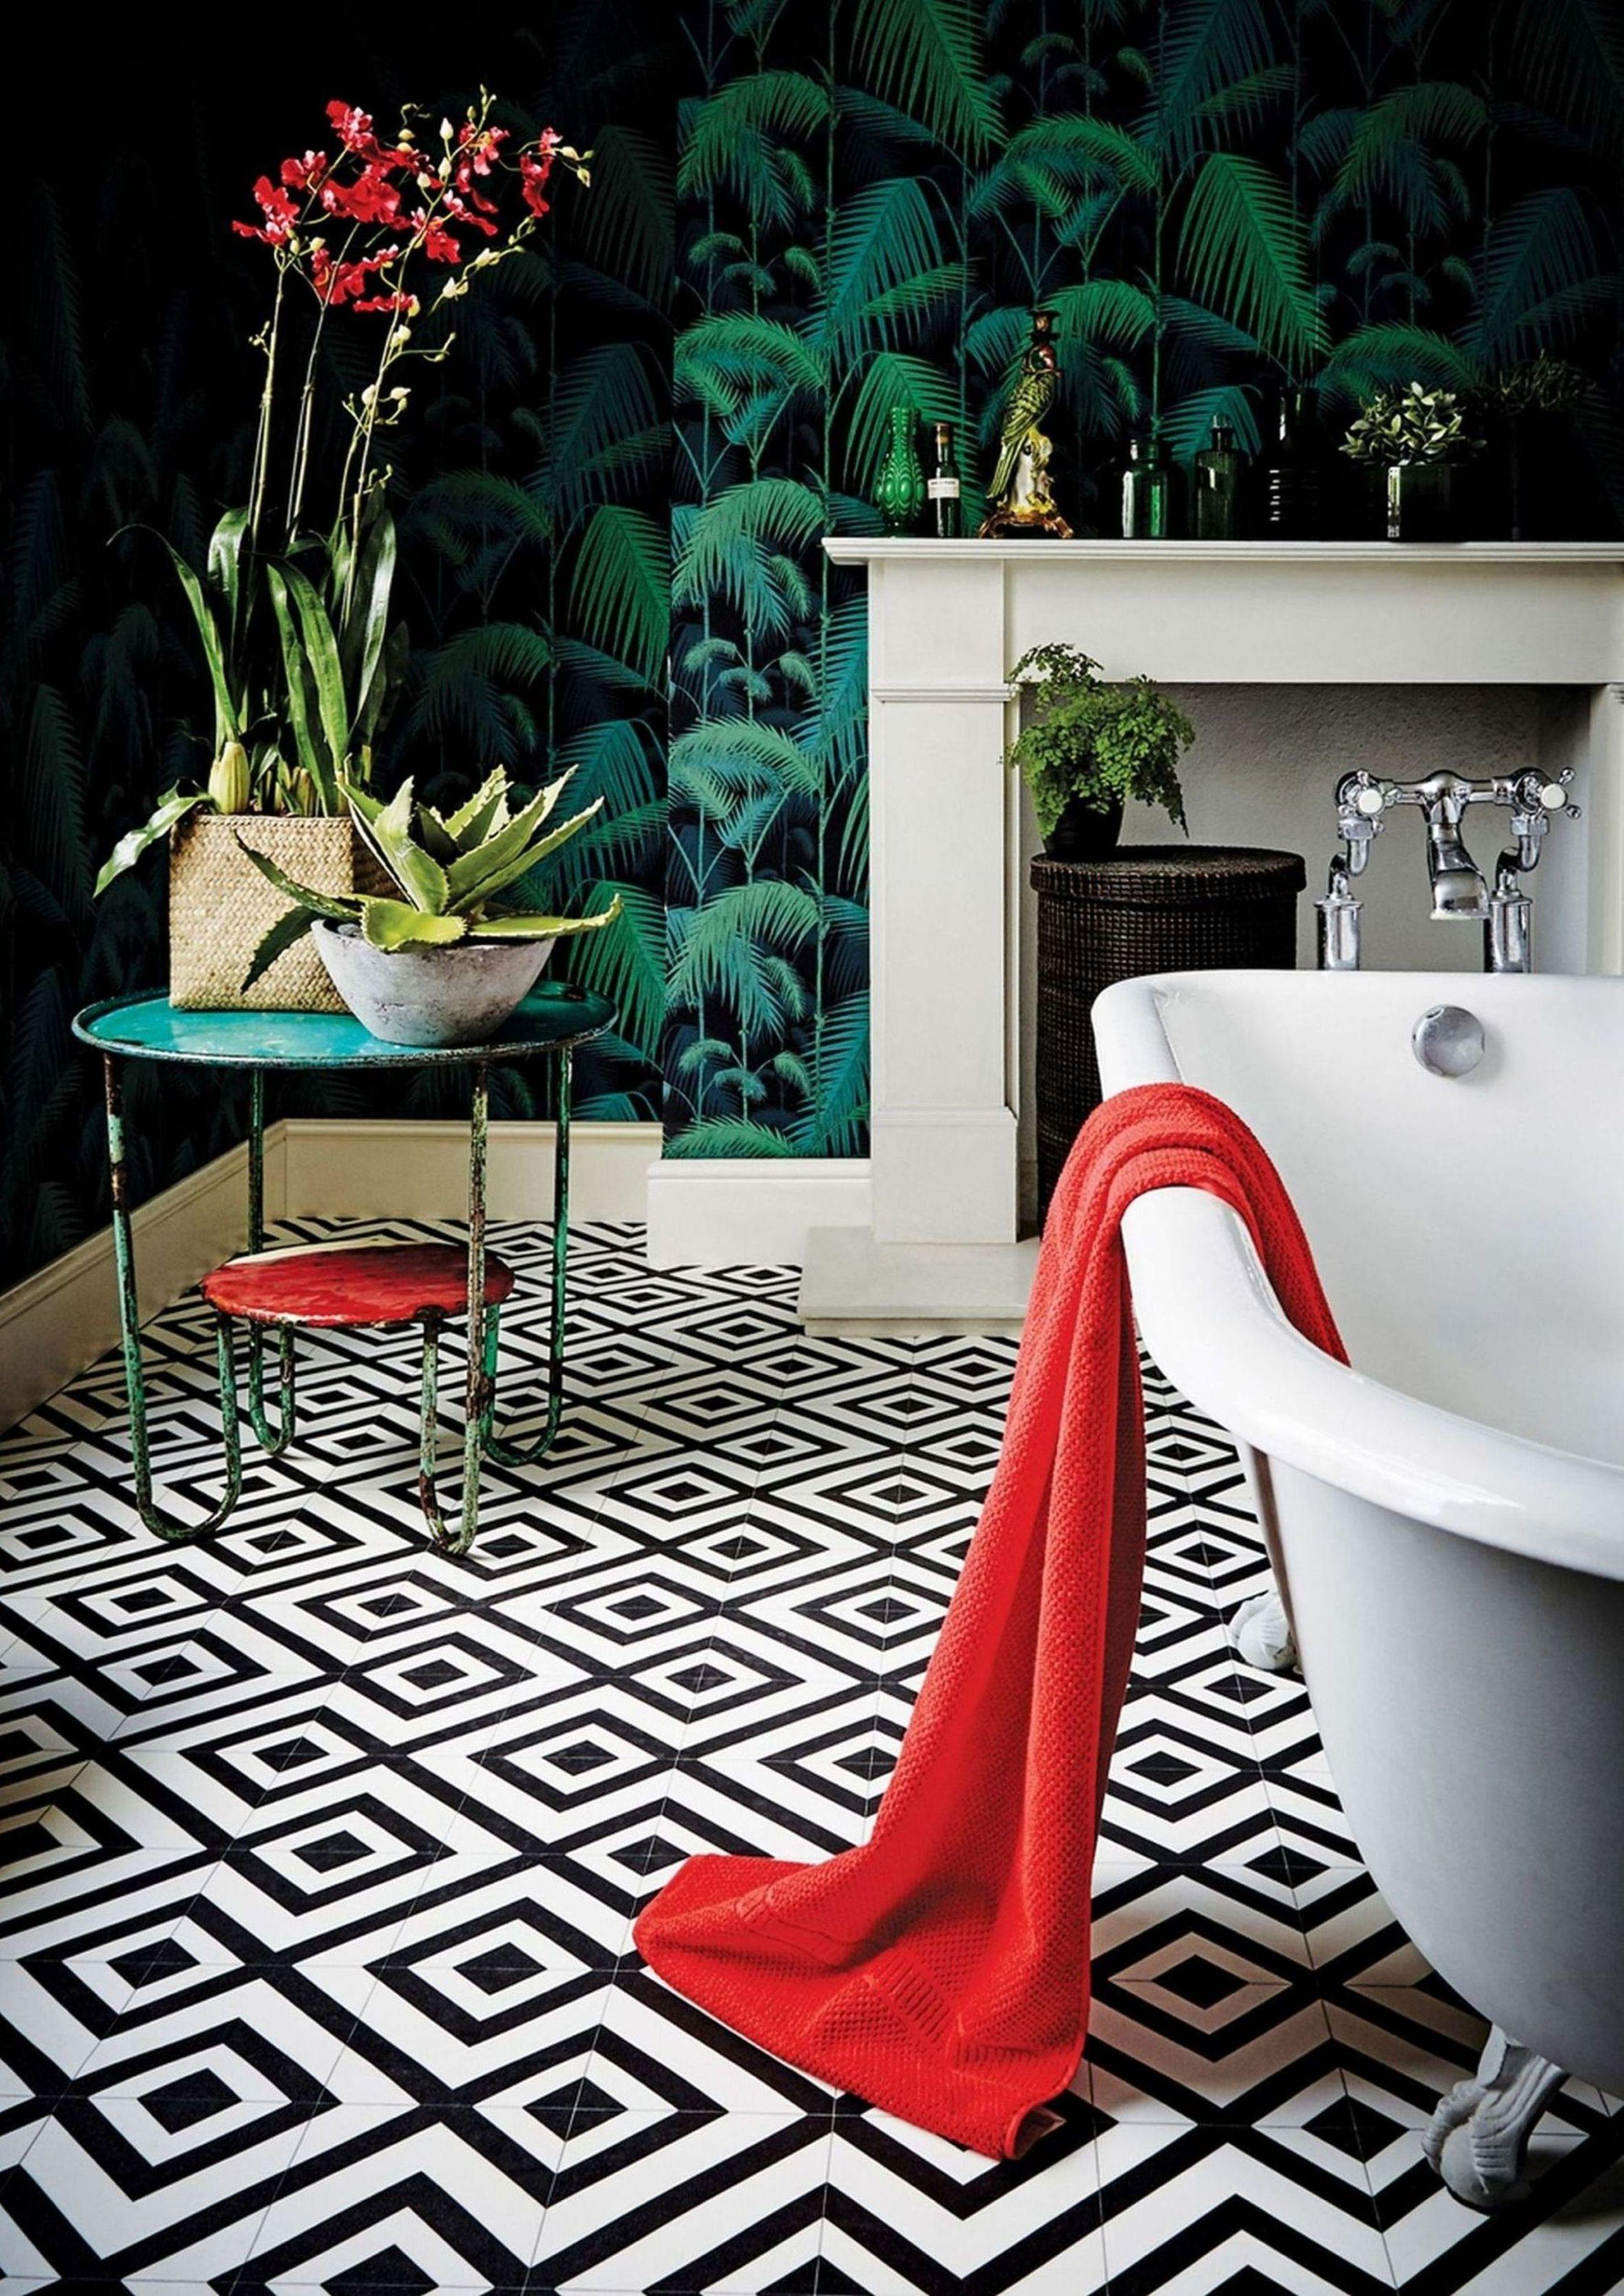 Bathroom Floor Tile Ideas 12 Beautiful Tile Designs To Inspire Your Scheme Real Homes